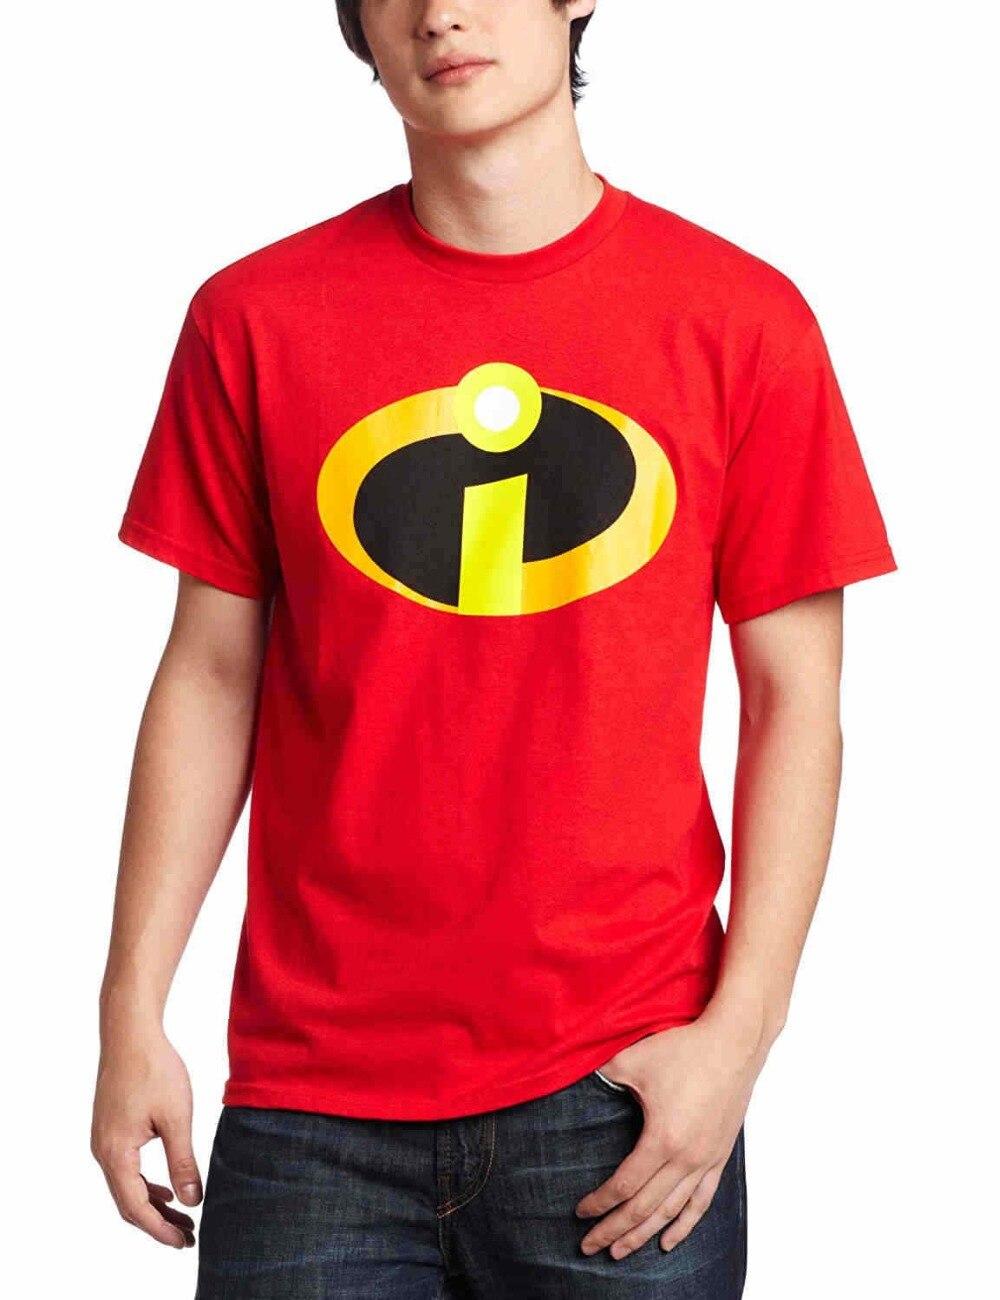 GüNstiger Verkauf 2018 T Shirt S Crew Neck 2018 Incredibles Herren Kostüm T Hemd Hohe Qualität Casual Kleidung Kurze T Shirt Herausragende Eigenschaften